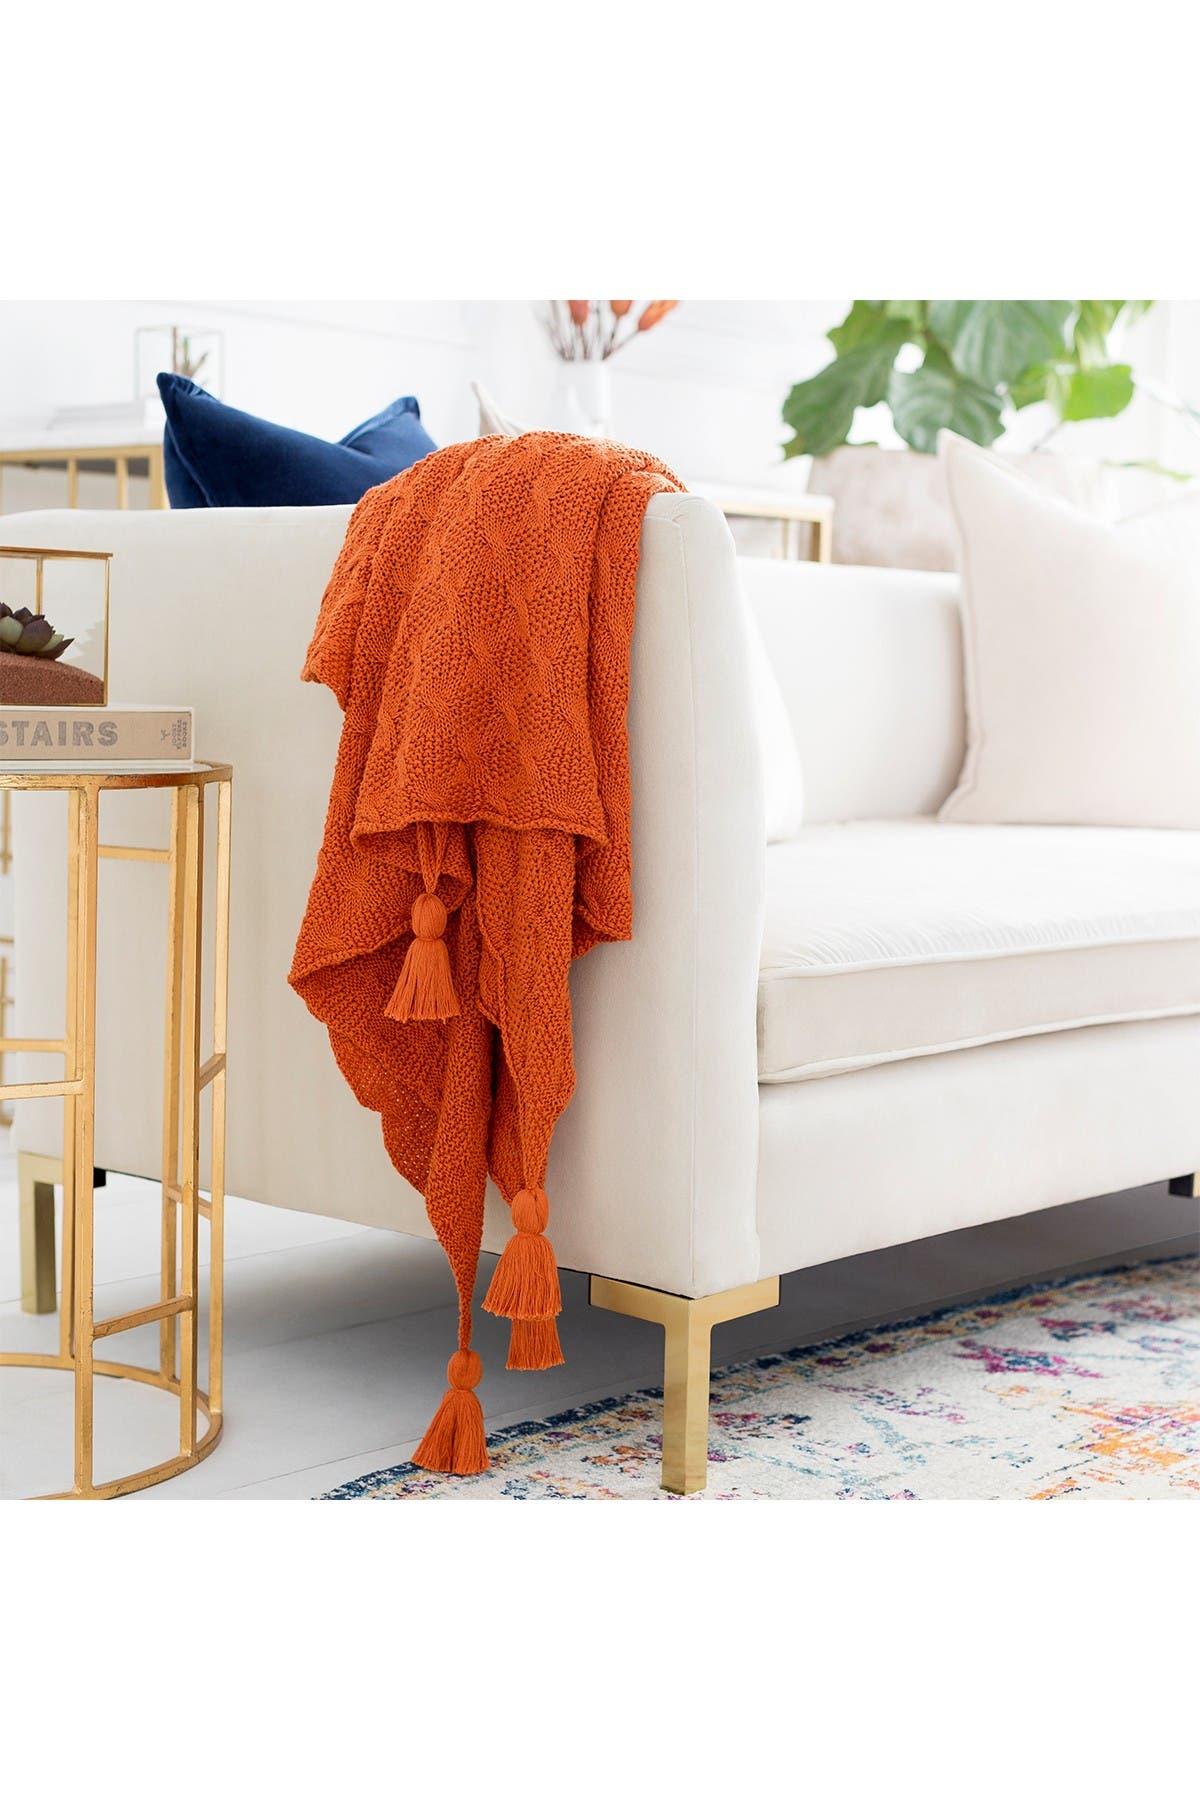 Image of SURYA HOME Bright Orange India Texture Throw